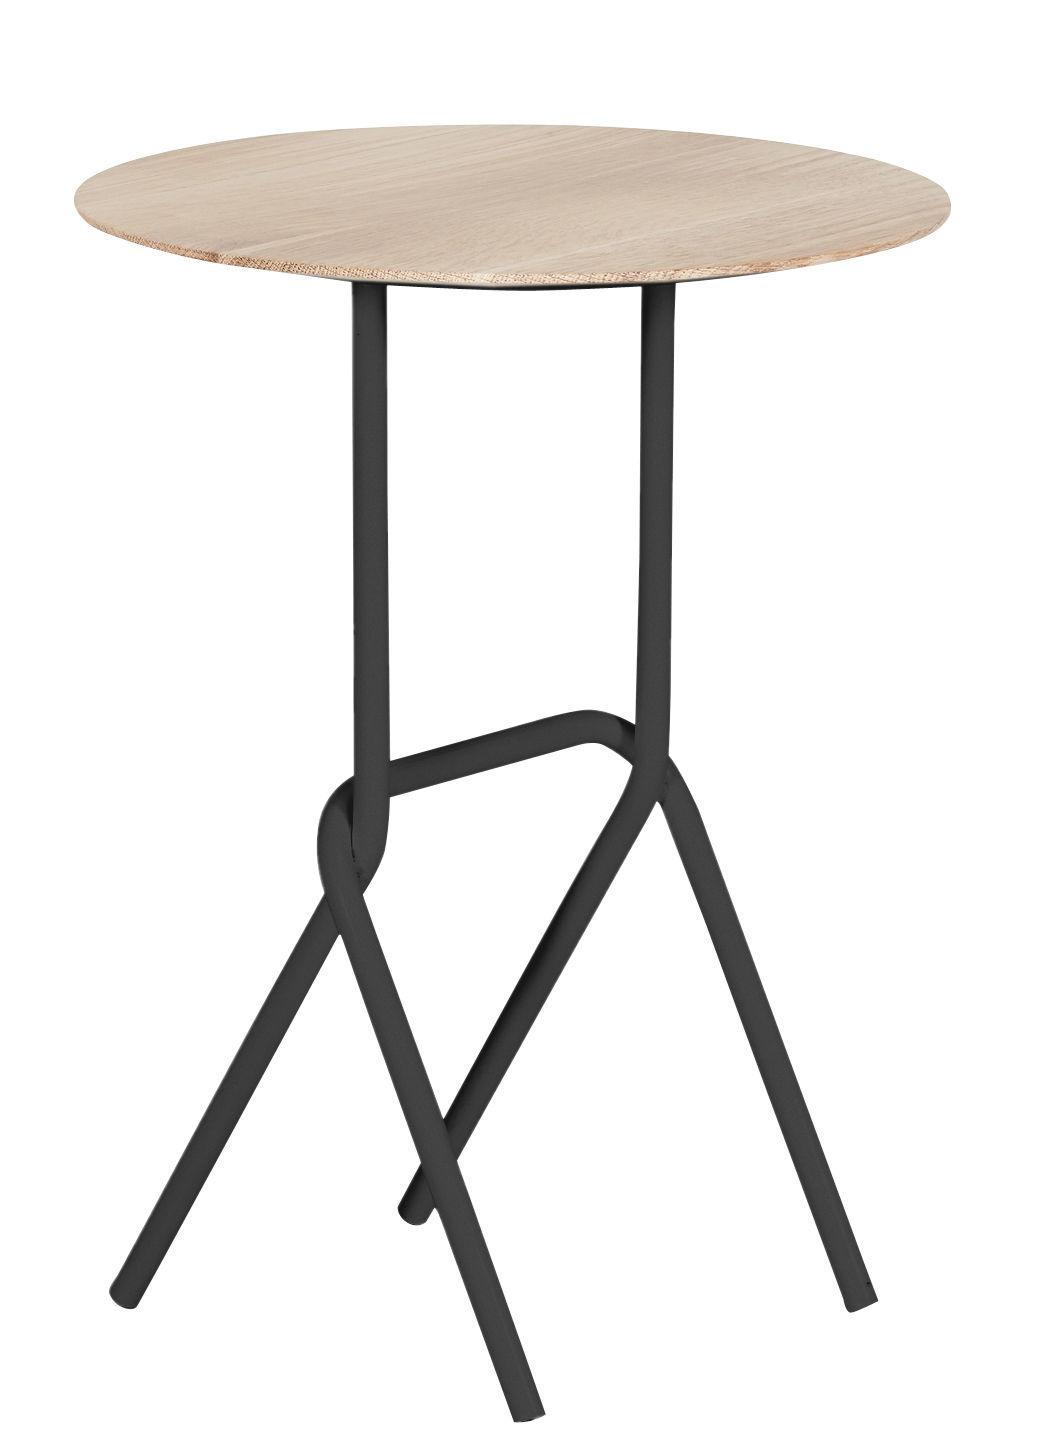 Mobilier - Tables basses - Table d'appoint Désiré / Guéridon - Hartô - Gris ardoise - Chêne, Métal